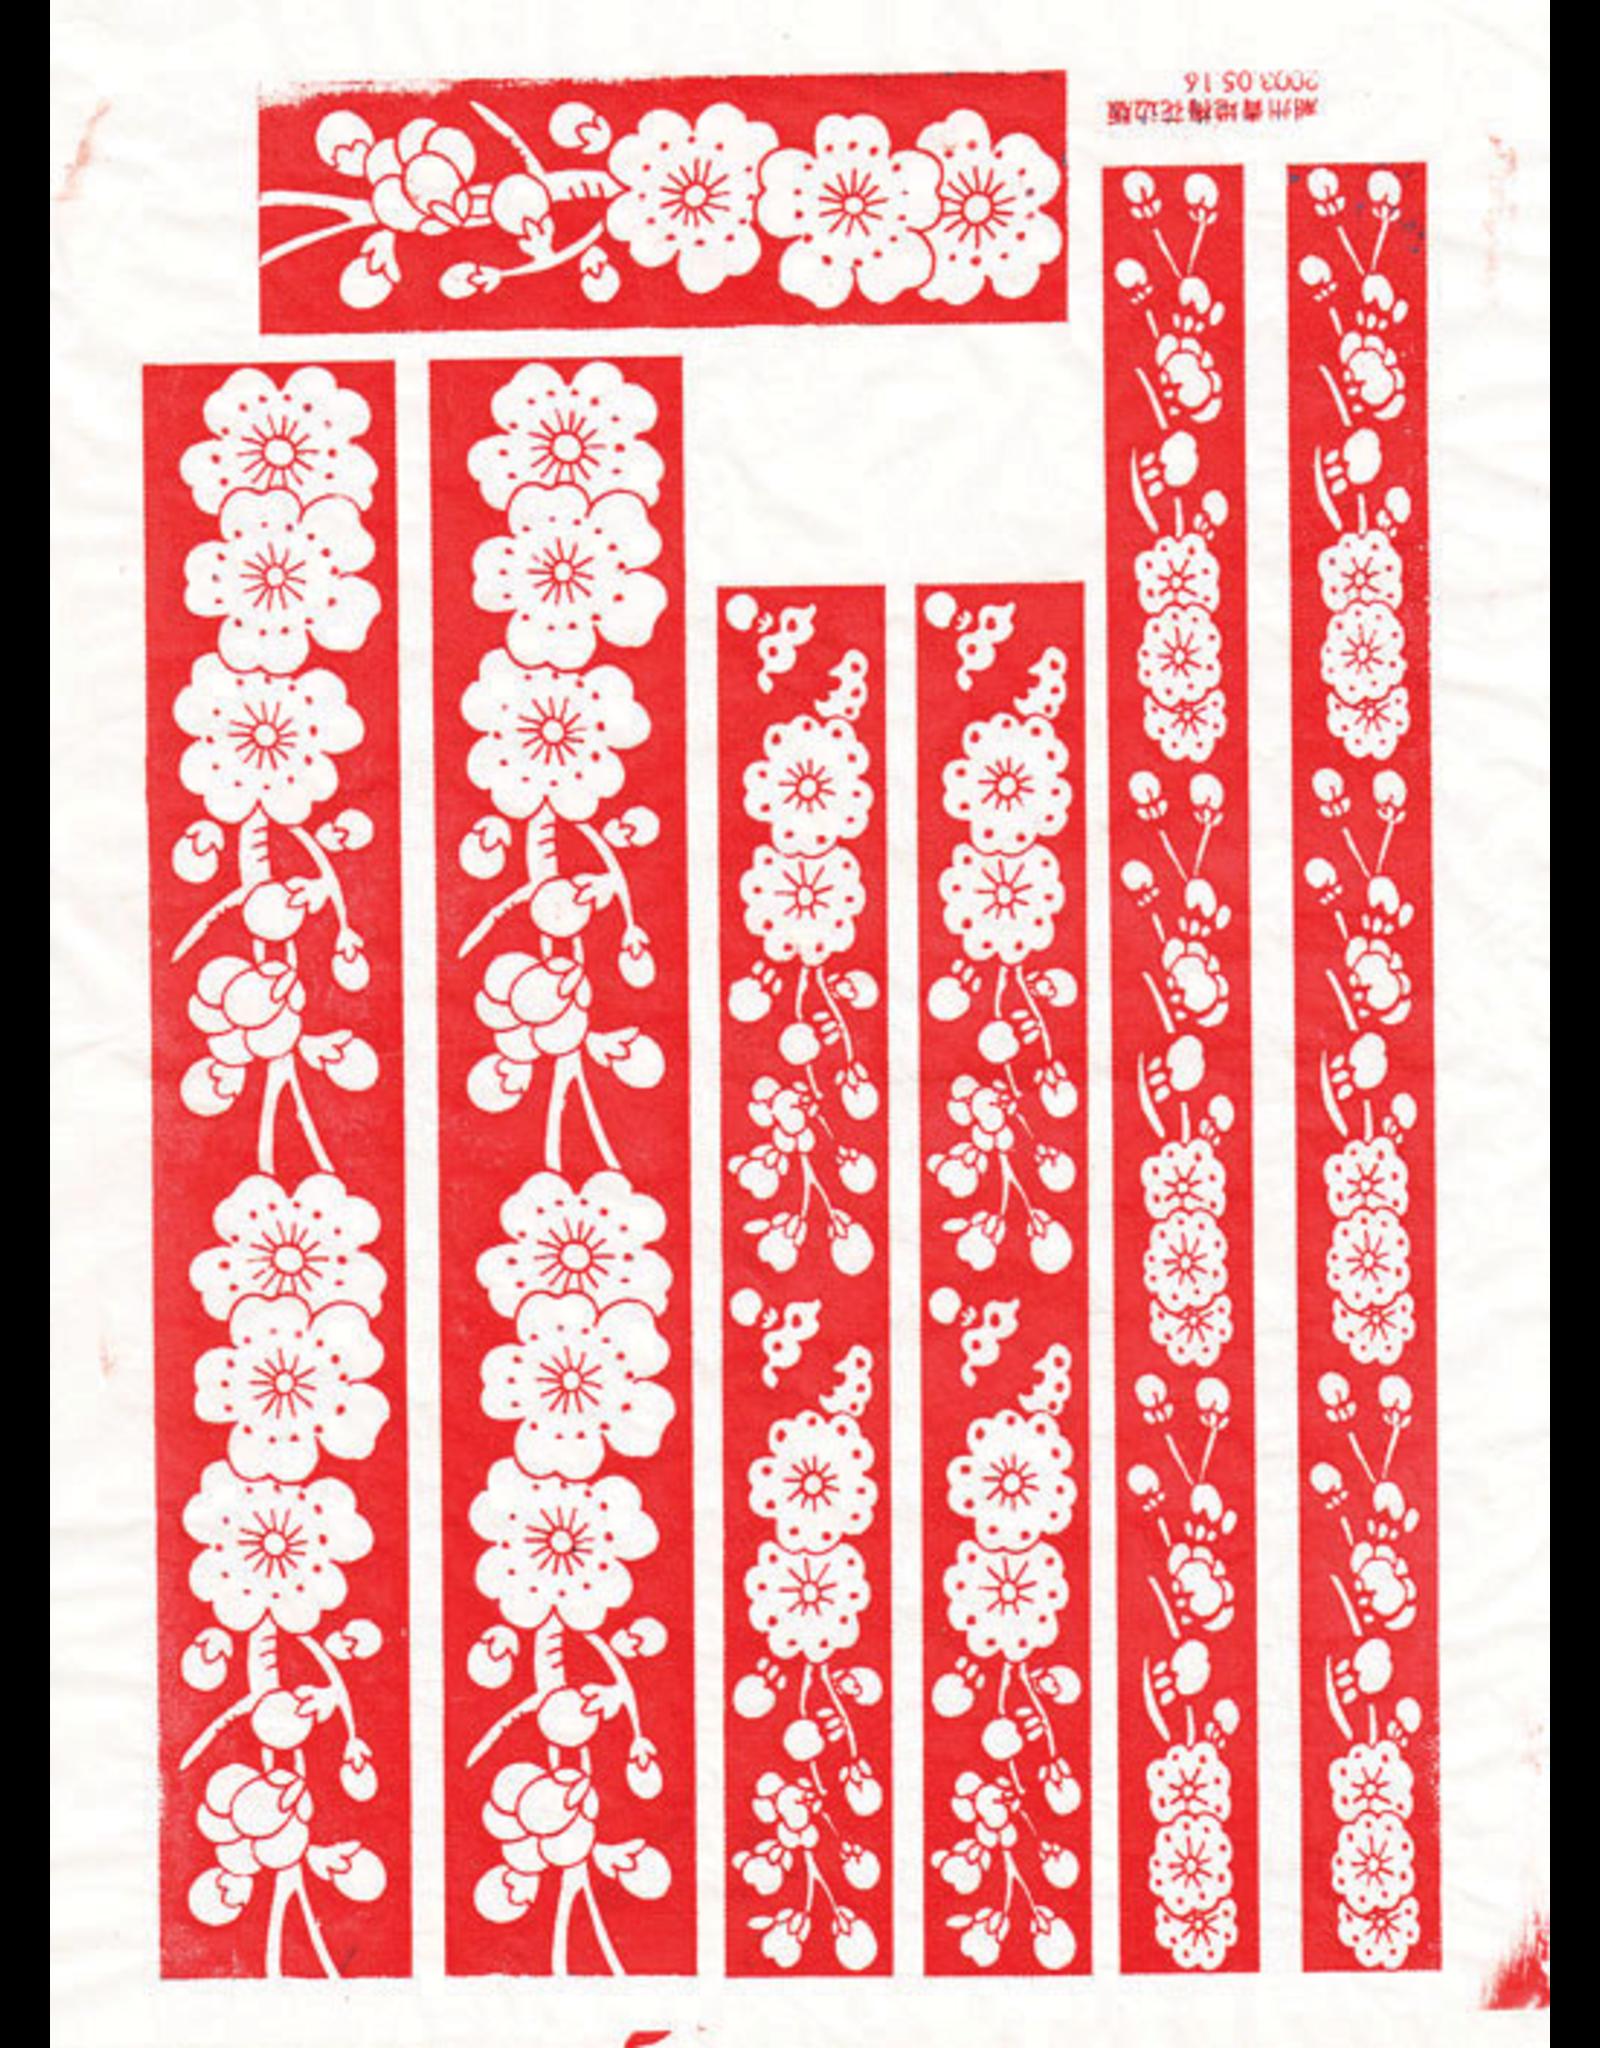 Sanbao Cherry flower decal 6